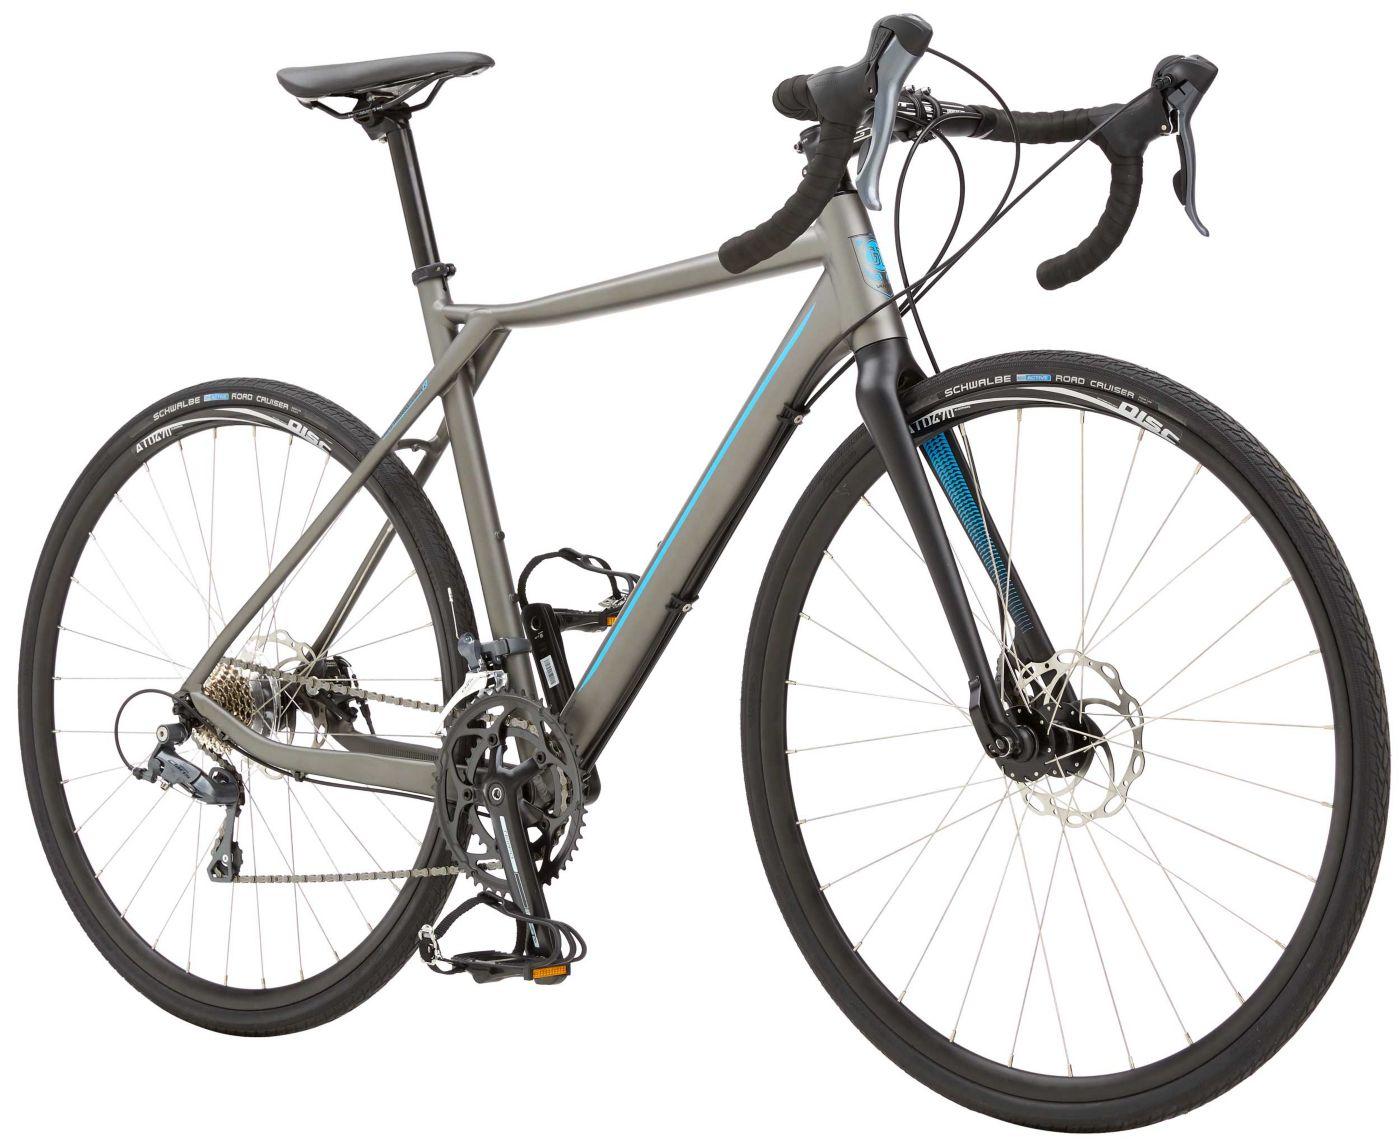 GT Men's Vantara Claris Road Bike